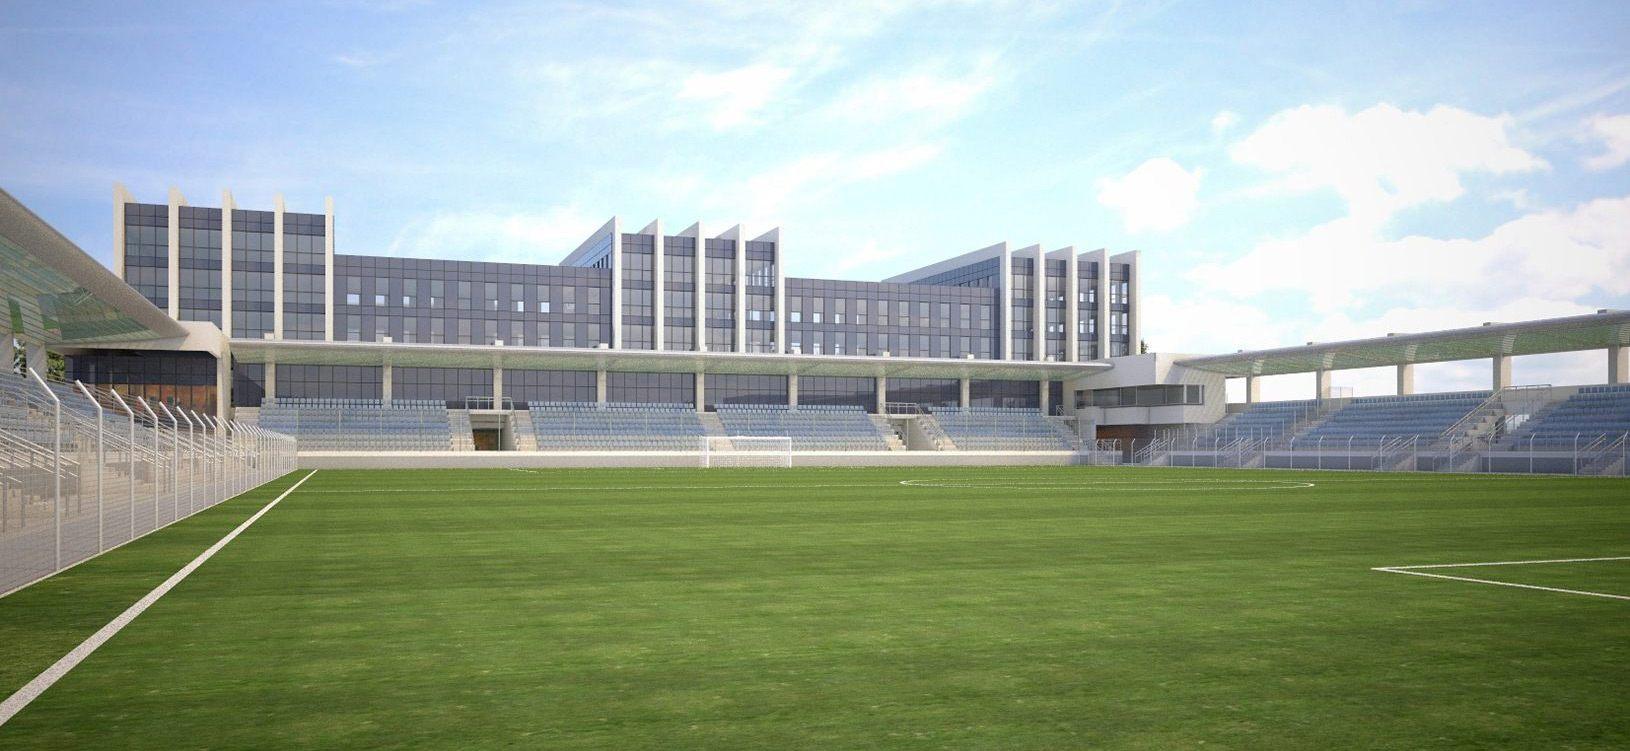 Stadion Garbarni przy Rydlówka 23